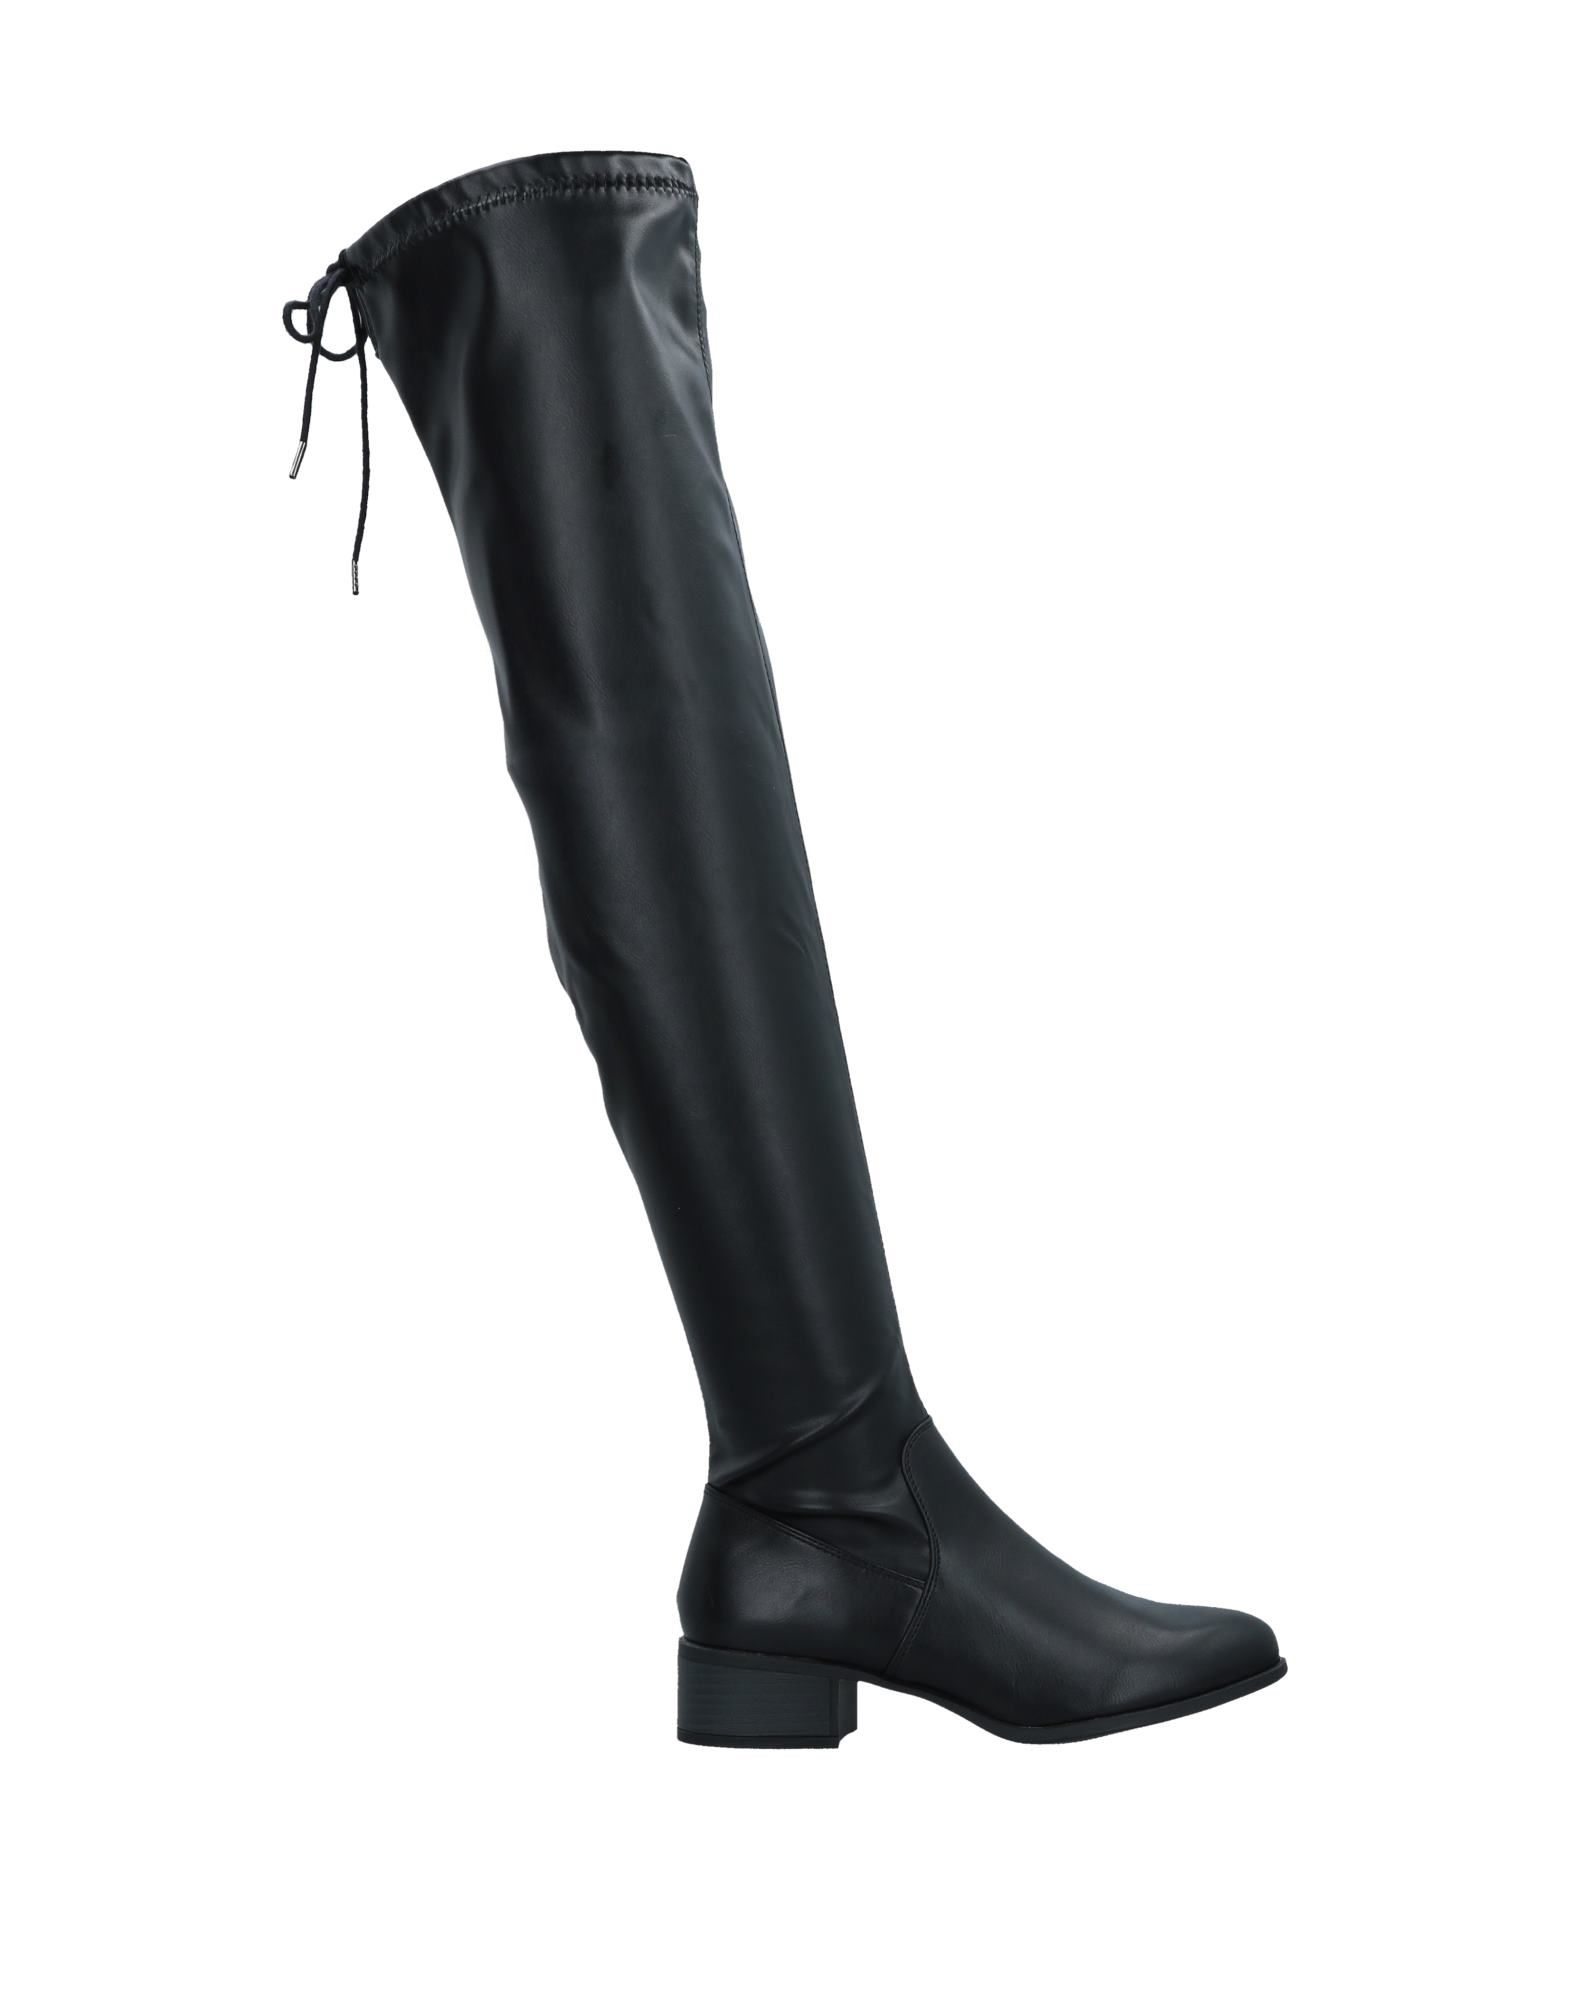 Madden Girl Stiefel Damen  11532132GD Gute Qualität beliebte Schuhe